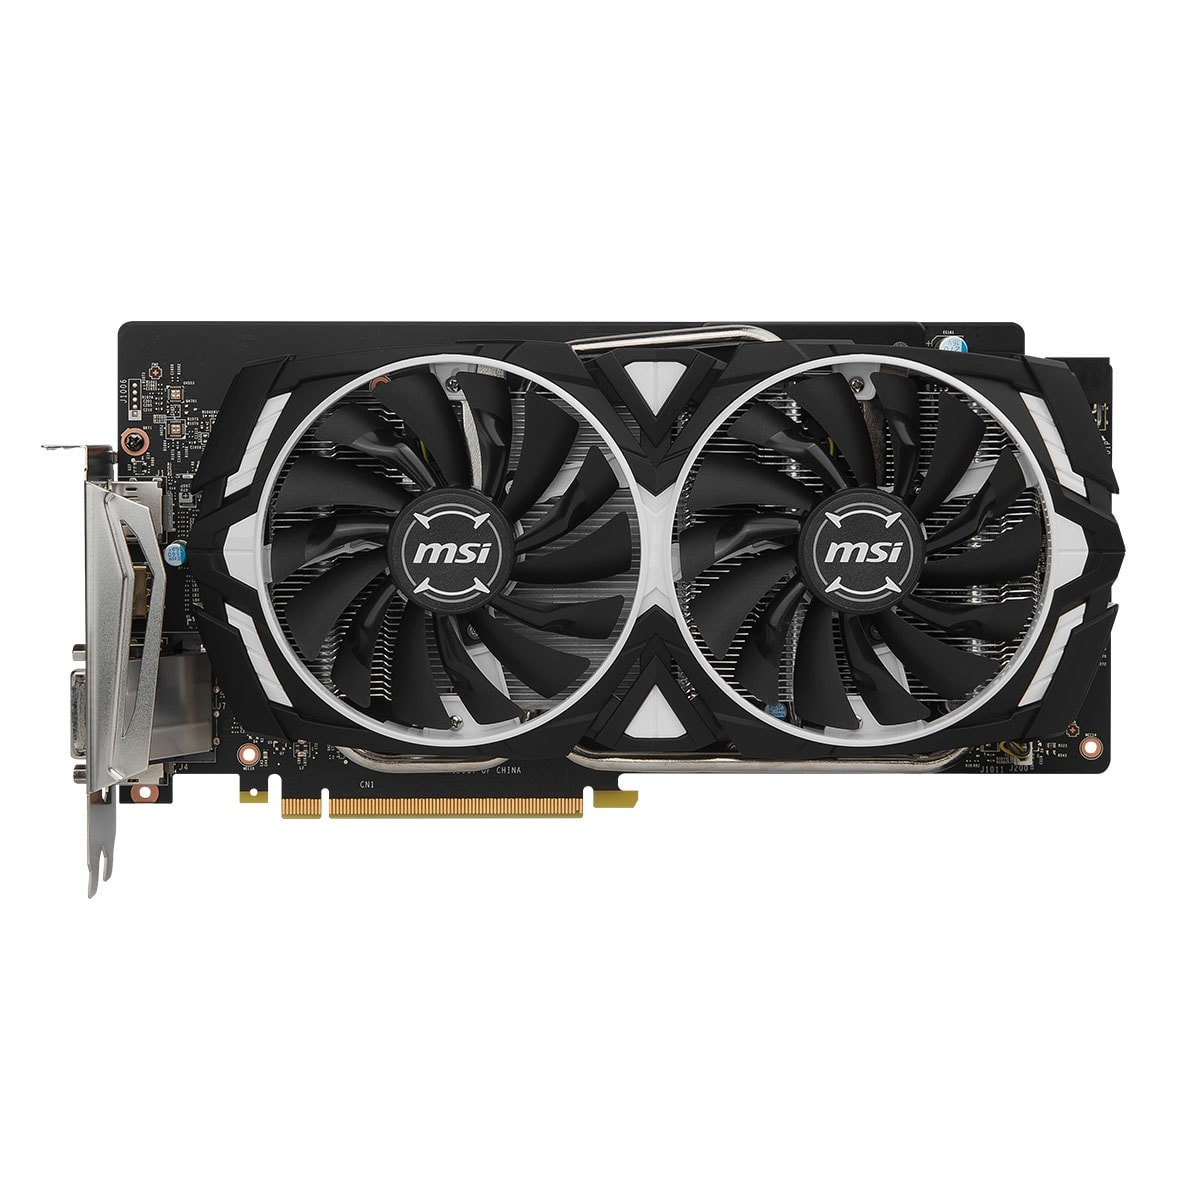 MSI GeForce GTX 1060 ARMOR 6G OC  (GTX 1060 ARMOR 6G OC --) - Achat / Vente Carte Graphique sur Cybertek.fr - 3